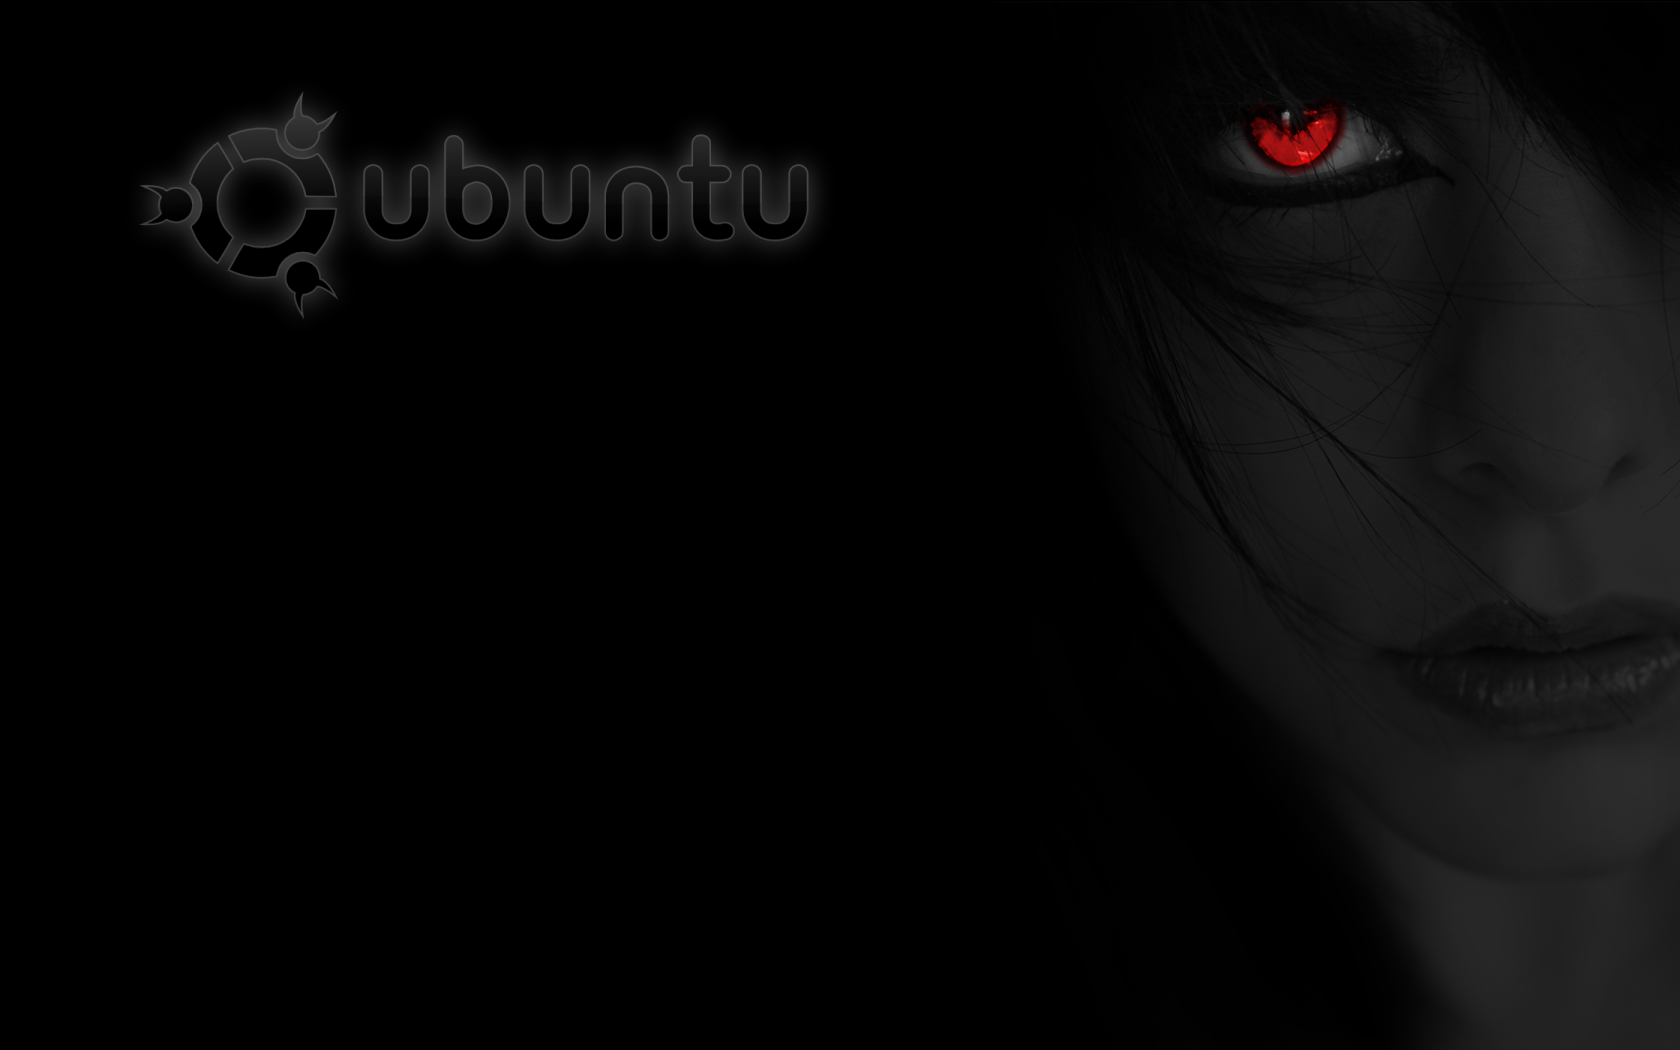 Free Download Dark Ubuntu Wallpaper 1680x1050 For Your Desktop